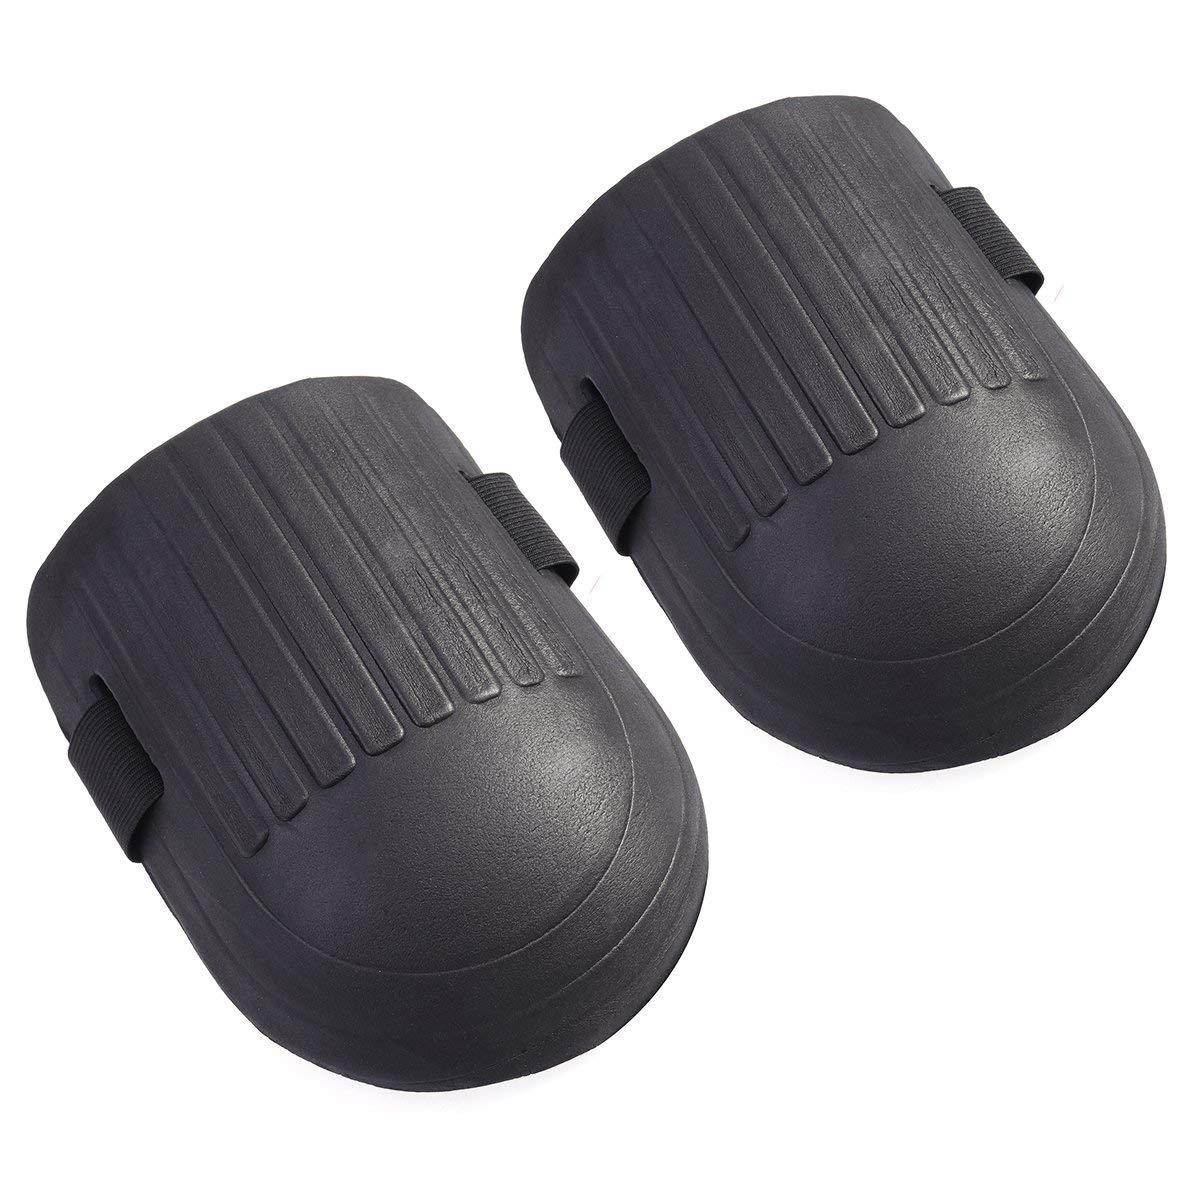 BESTOMZ 1 Pair Gardening Protective Gear Soft Knee Pads with Waterproof EVA Foam Cushion Soft Inner Liner (Black)